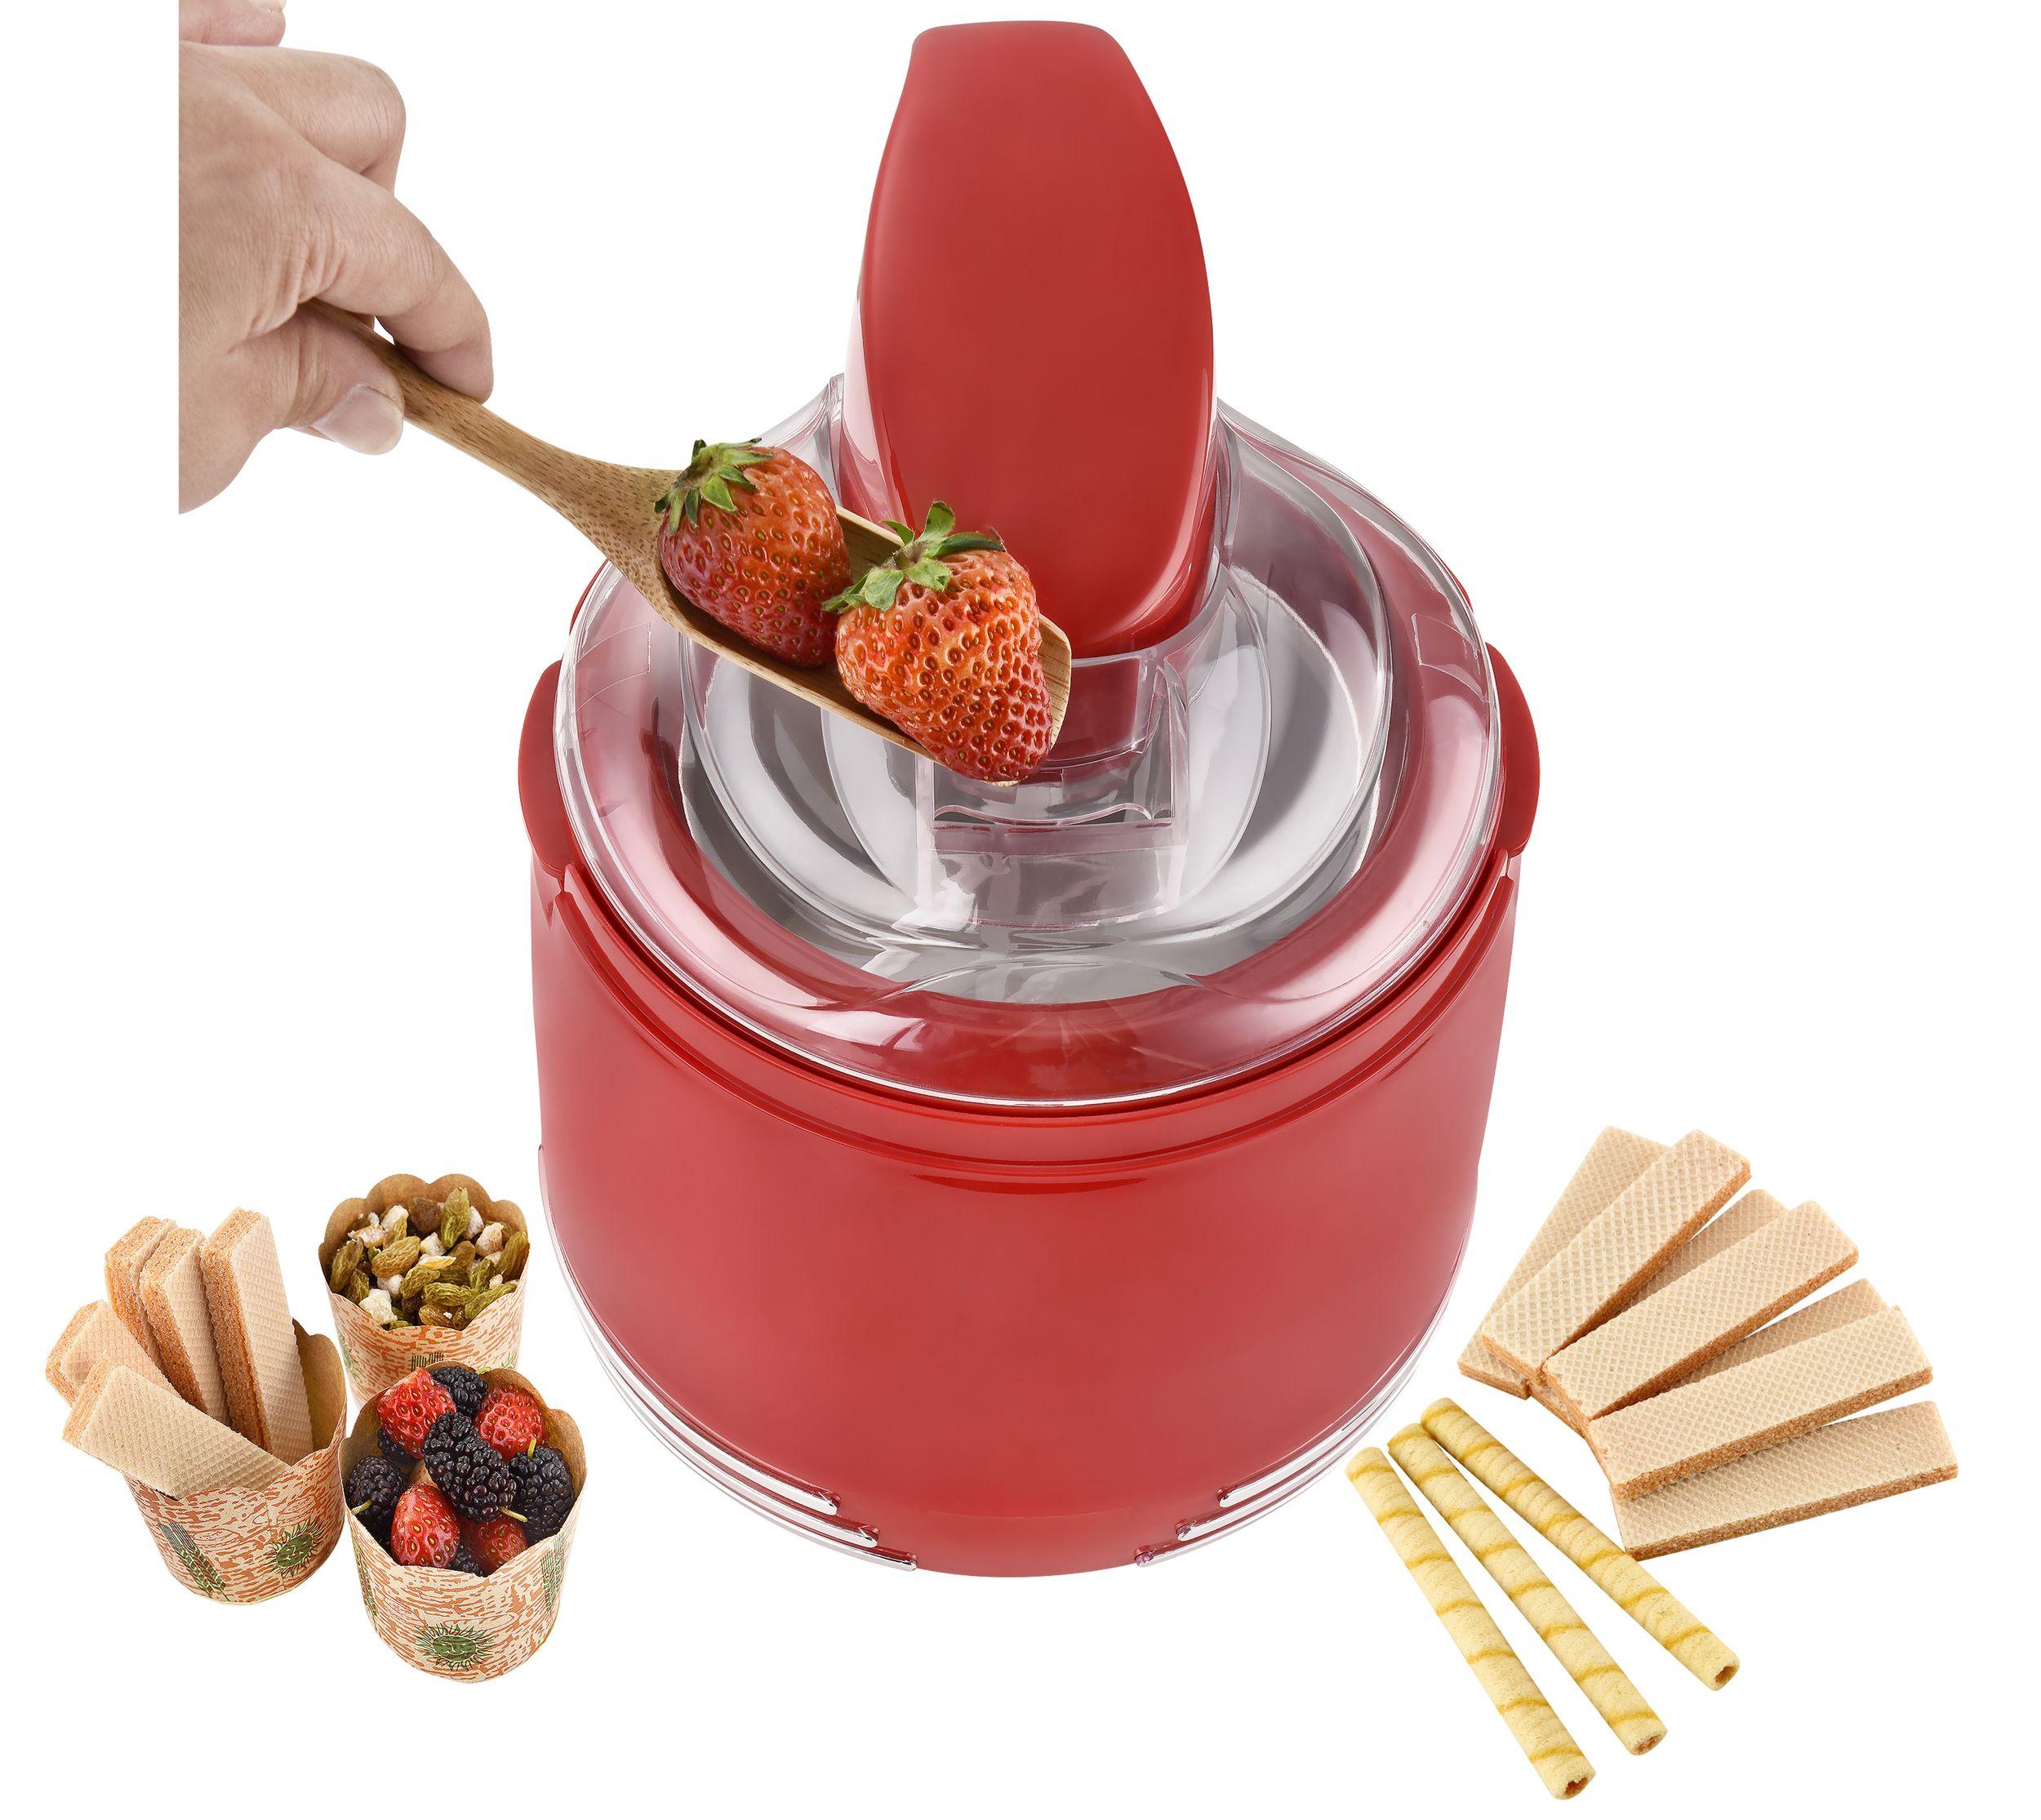 2 in 1 Retro Eismaschine Joghurtbereiter Eiscreme Joghurt Maker Kühlgefäß rot NEU 15 W *94074 Bild 2